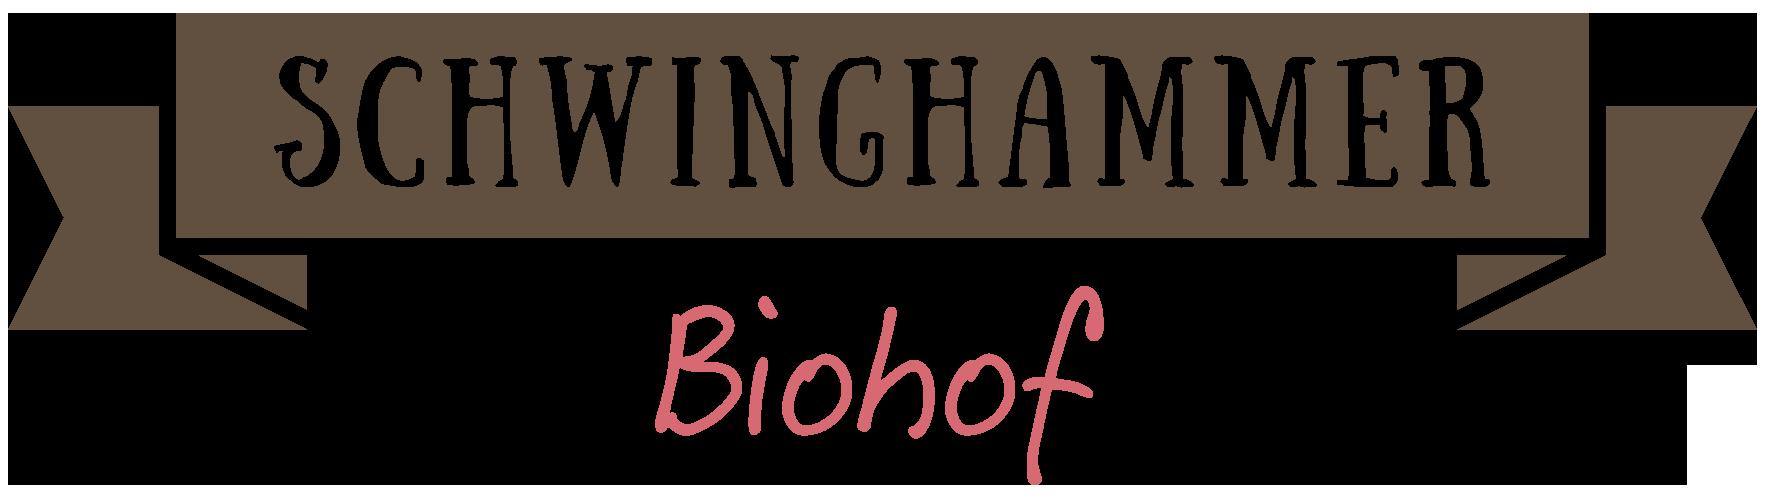 Biohof Schwinghammer